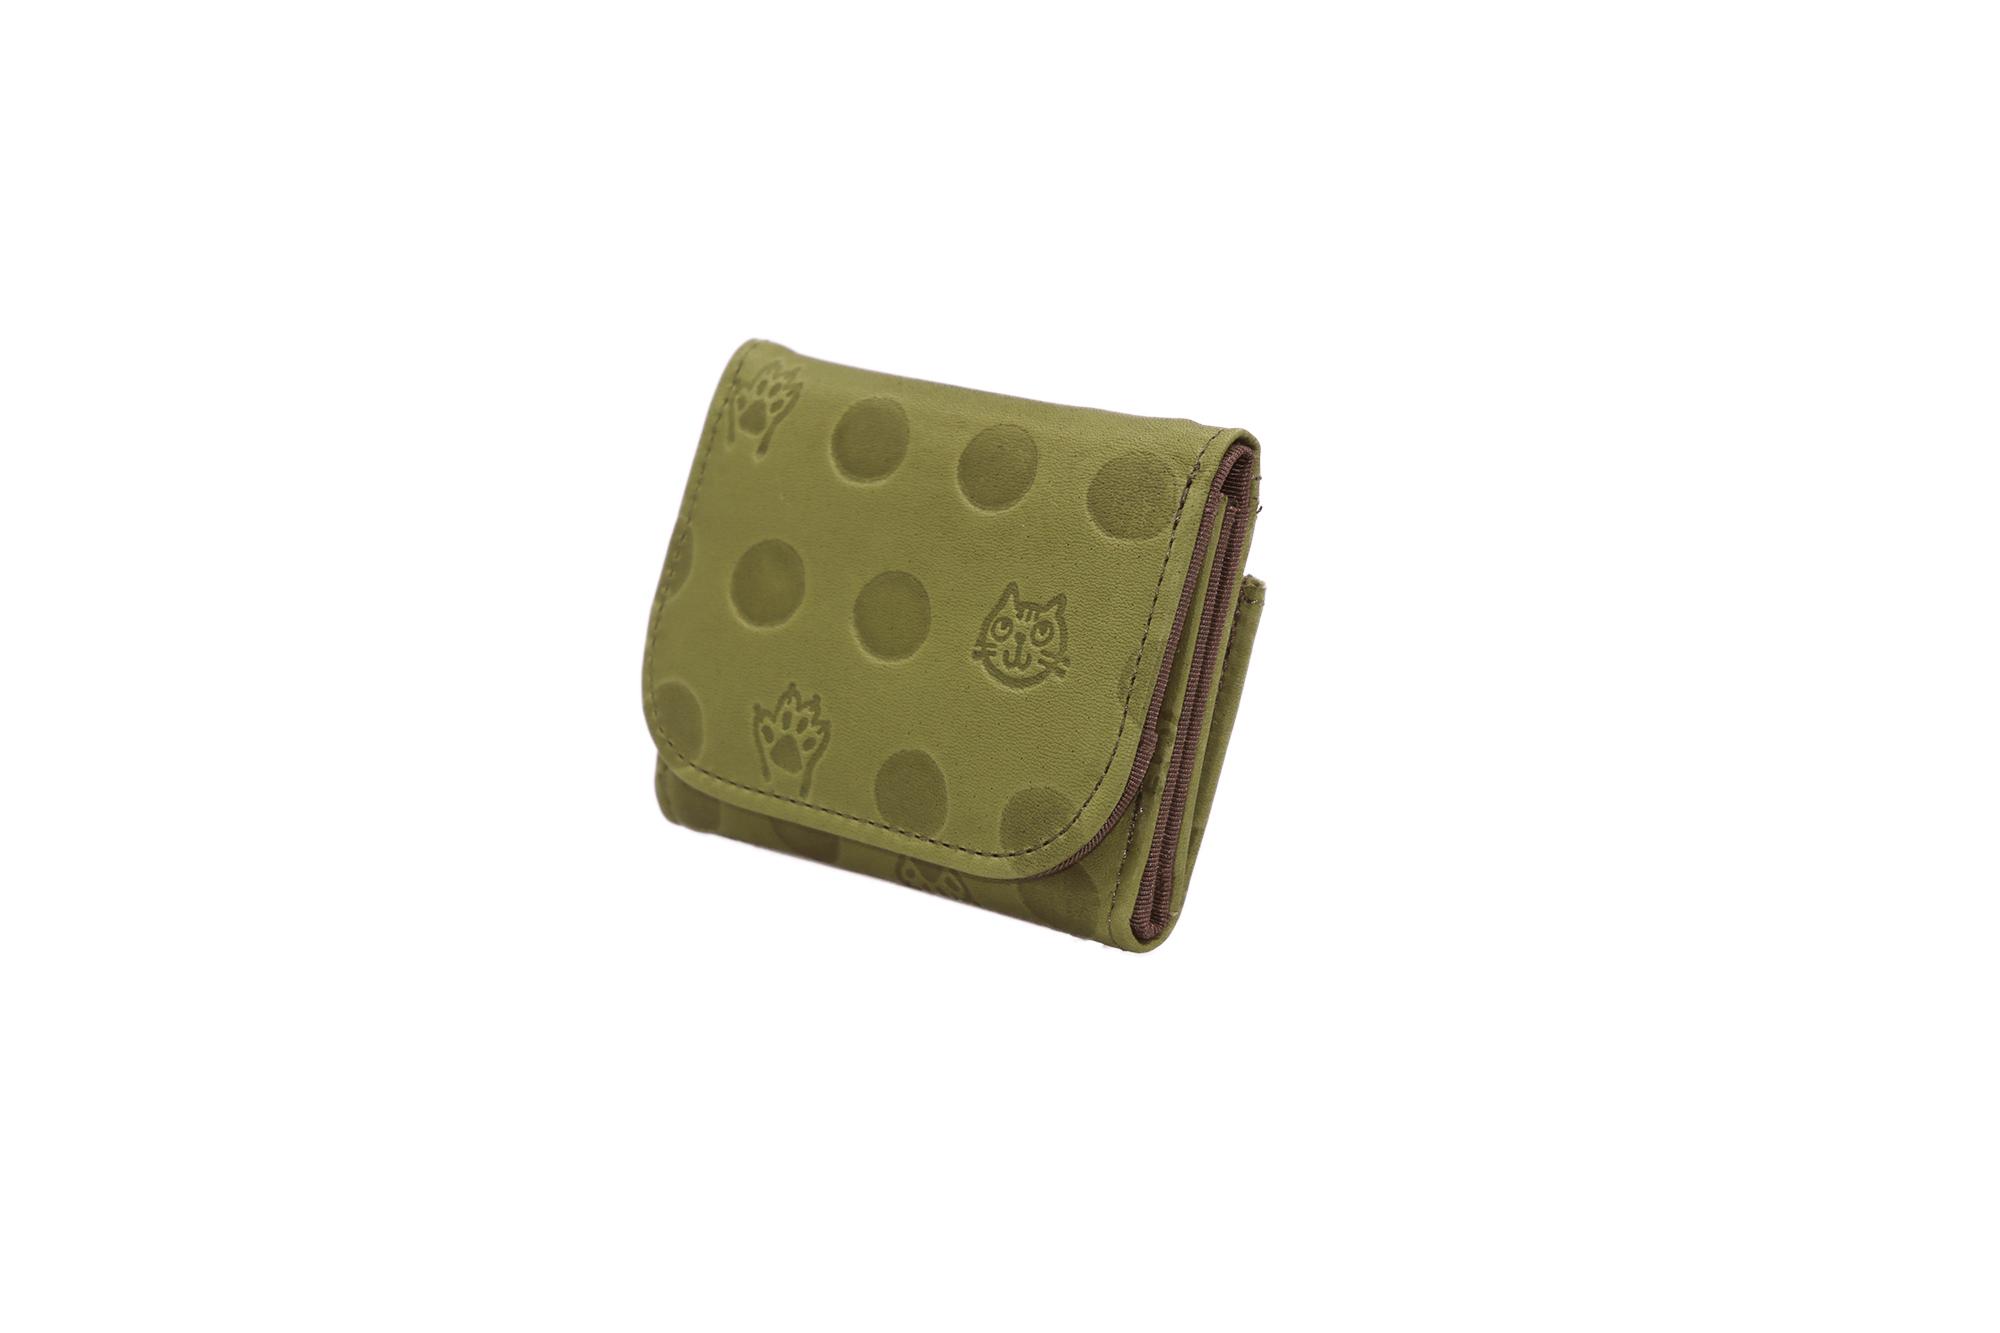 Atelier Kyoto Nishijin/ねこと肉球の型押しが可愛い・牛革・手乗りコンパクト財布・鶯色(うぐいすいろ)・日本製